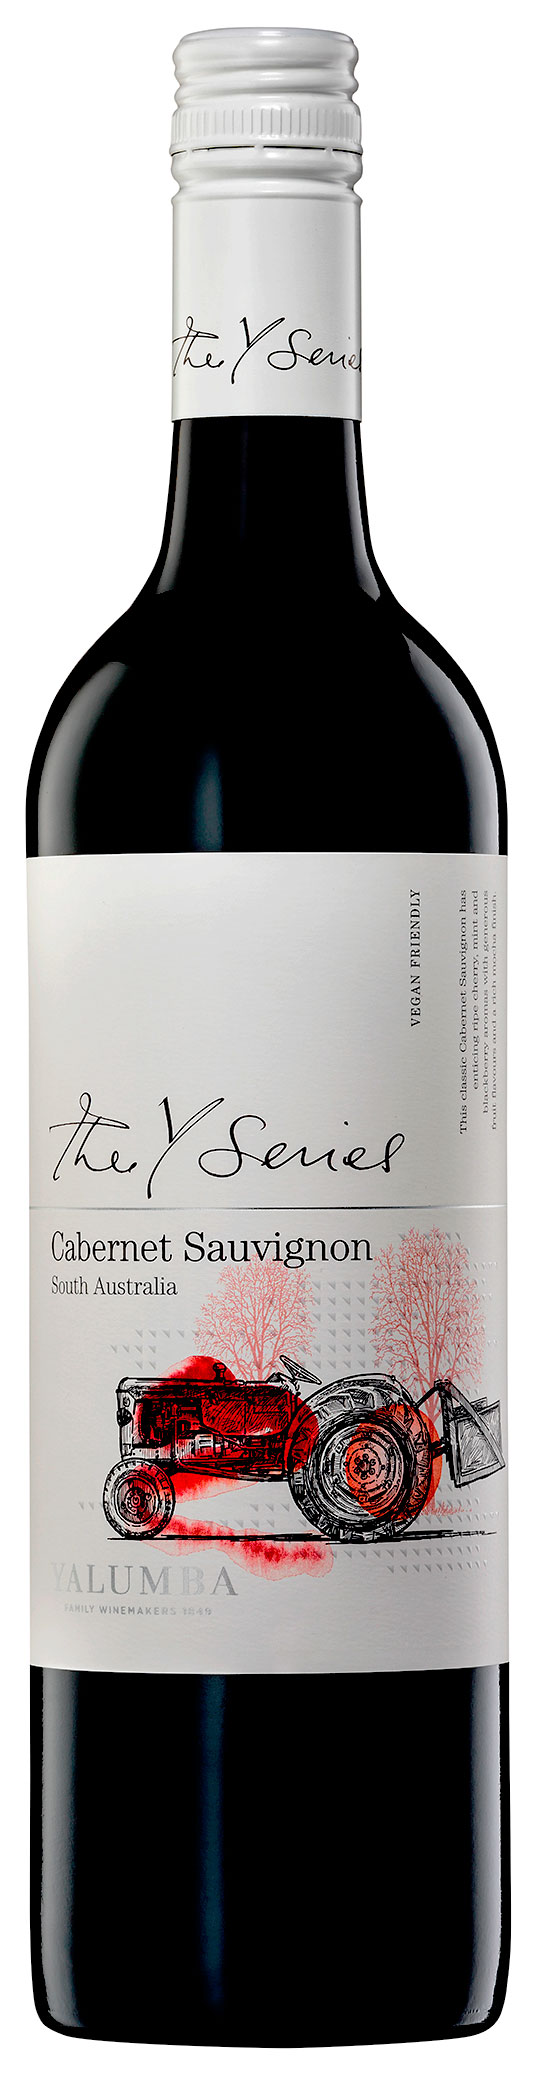 https://vinocorpperu.com/images/vinos/yalumba/y_series_cabernet_sauvignon_2018.jpg